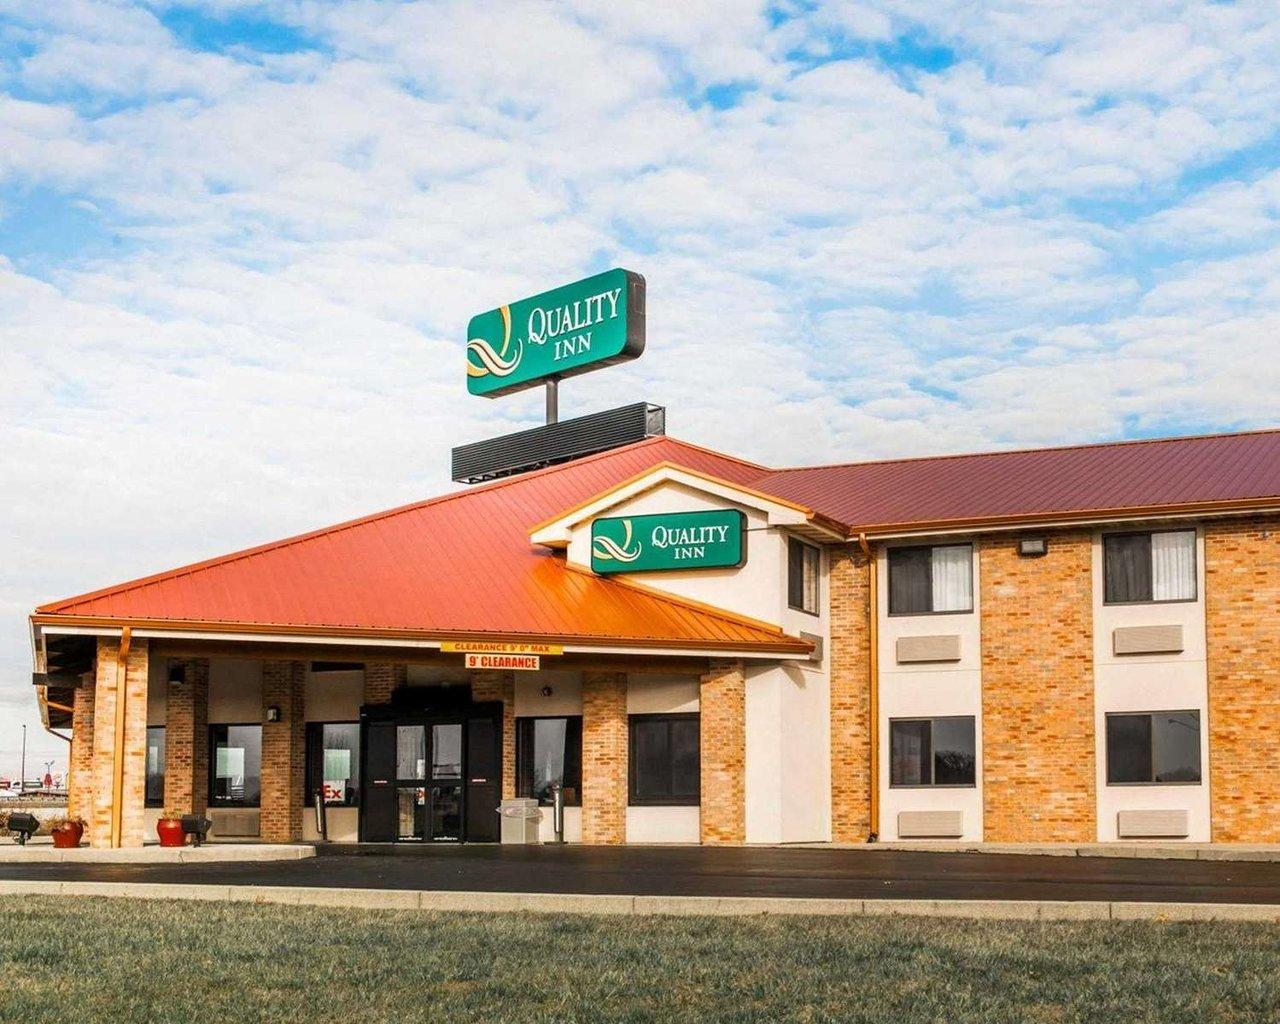 Quality Inn 72 9 1 Prices Hotel Reviews Effingham Il Tripadvisor